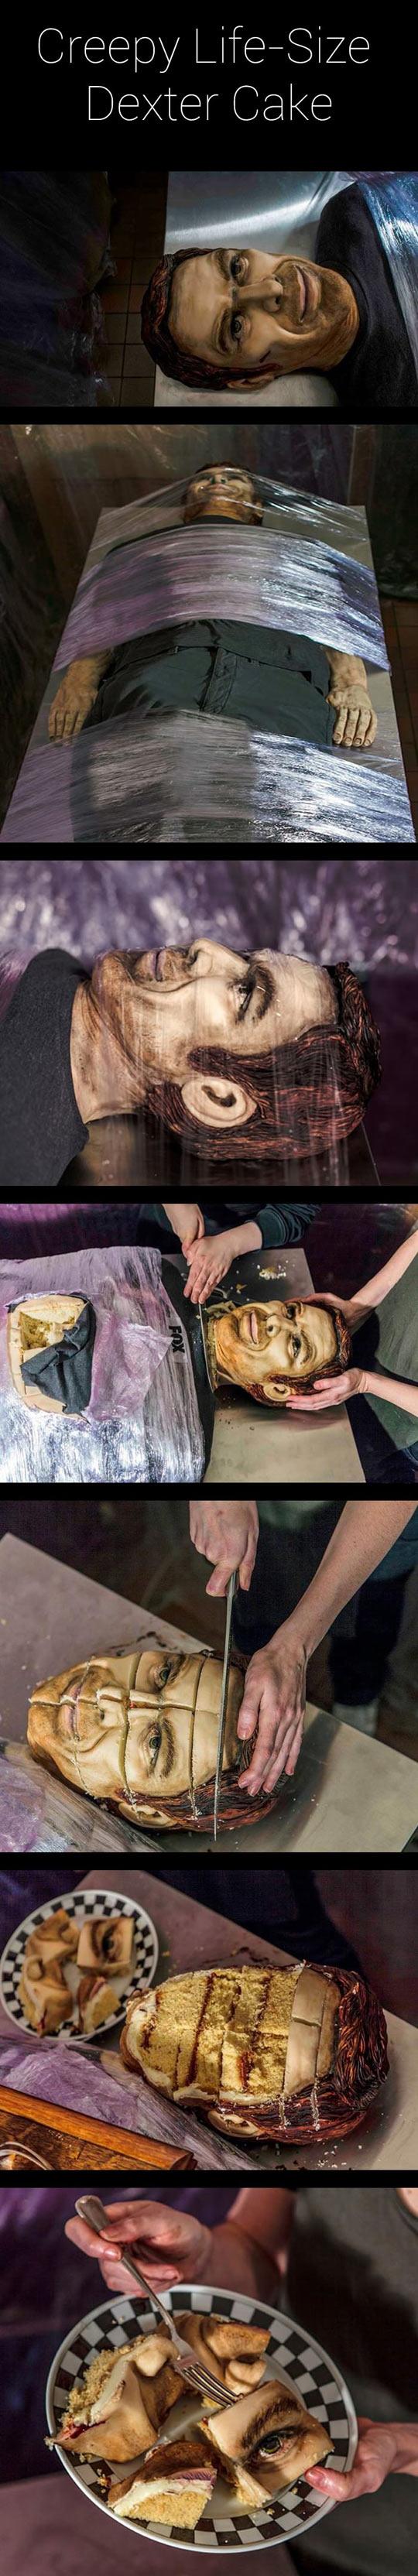 Creepy life size Dexter cake…